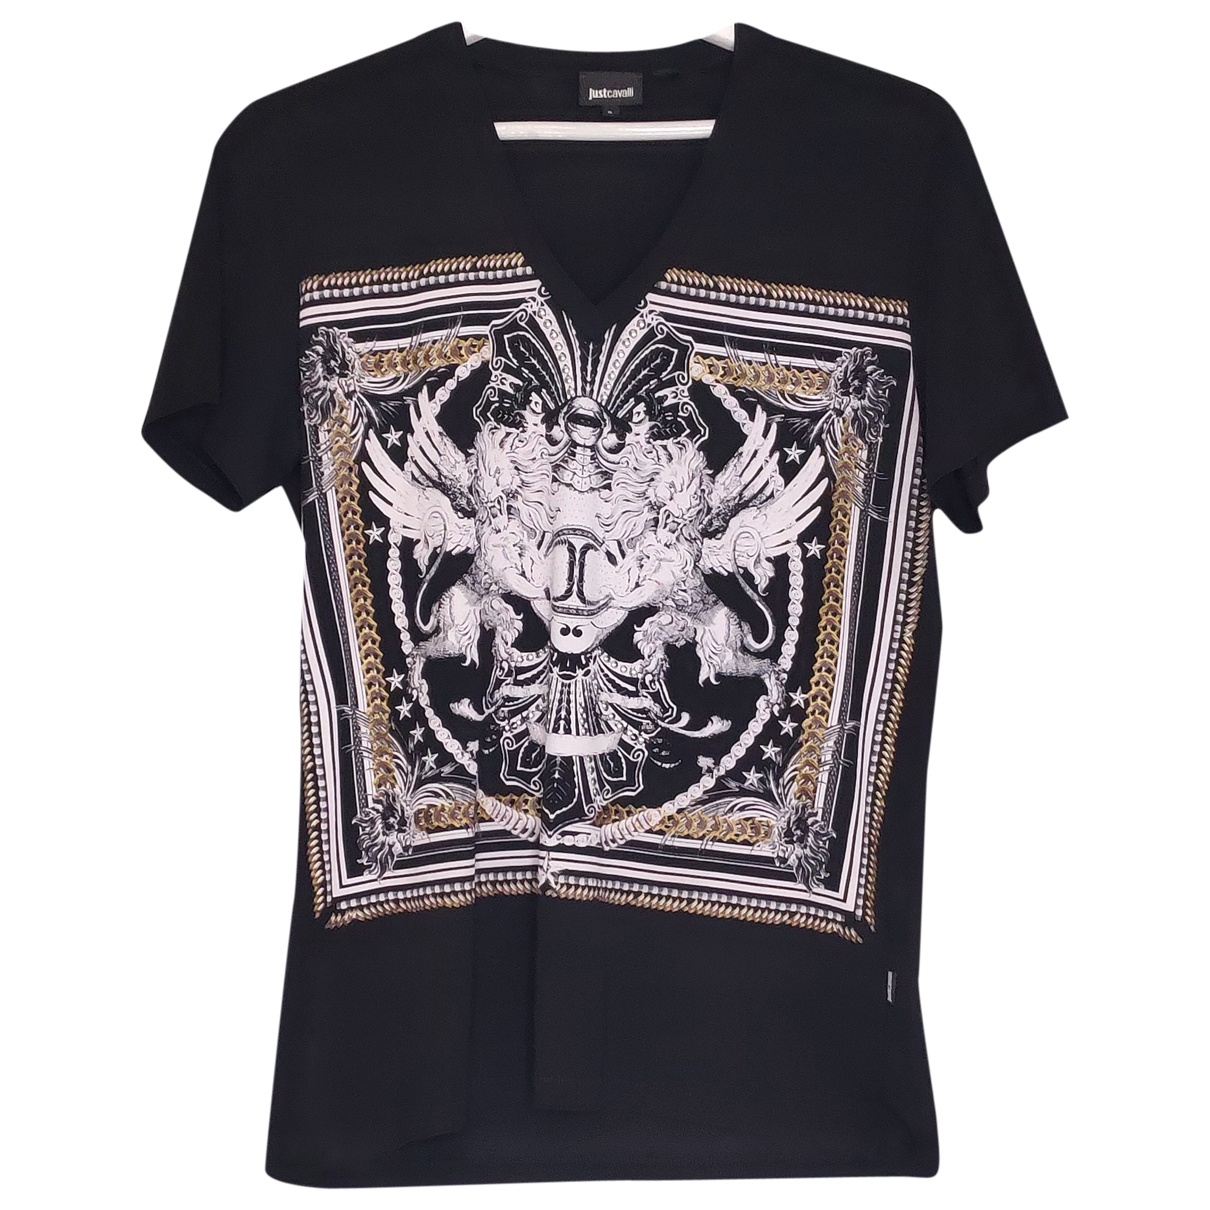 Roberto Cavalli \N Black Cotton T-shirts for Men S International